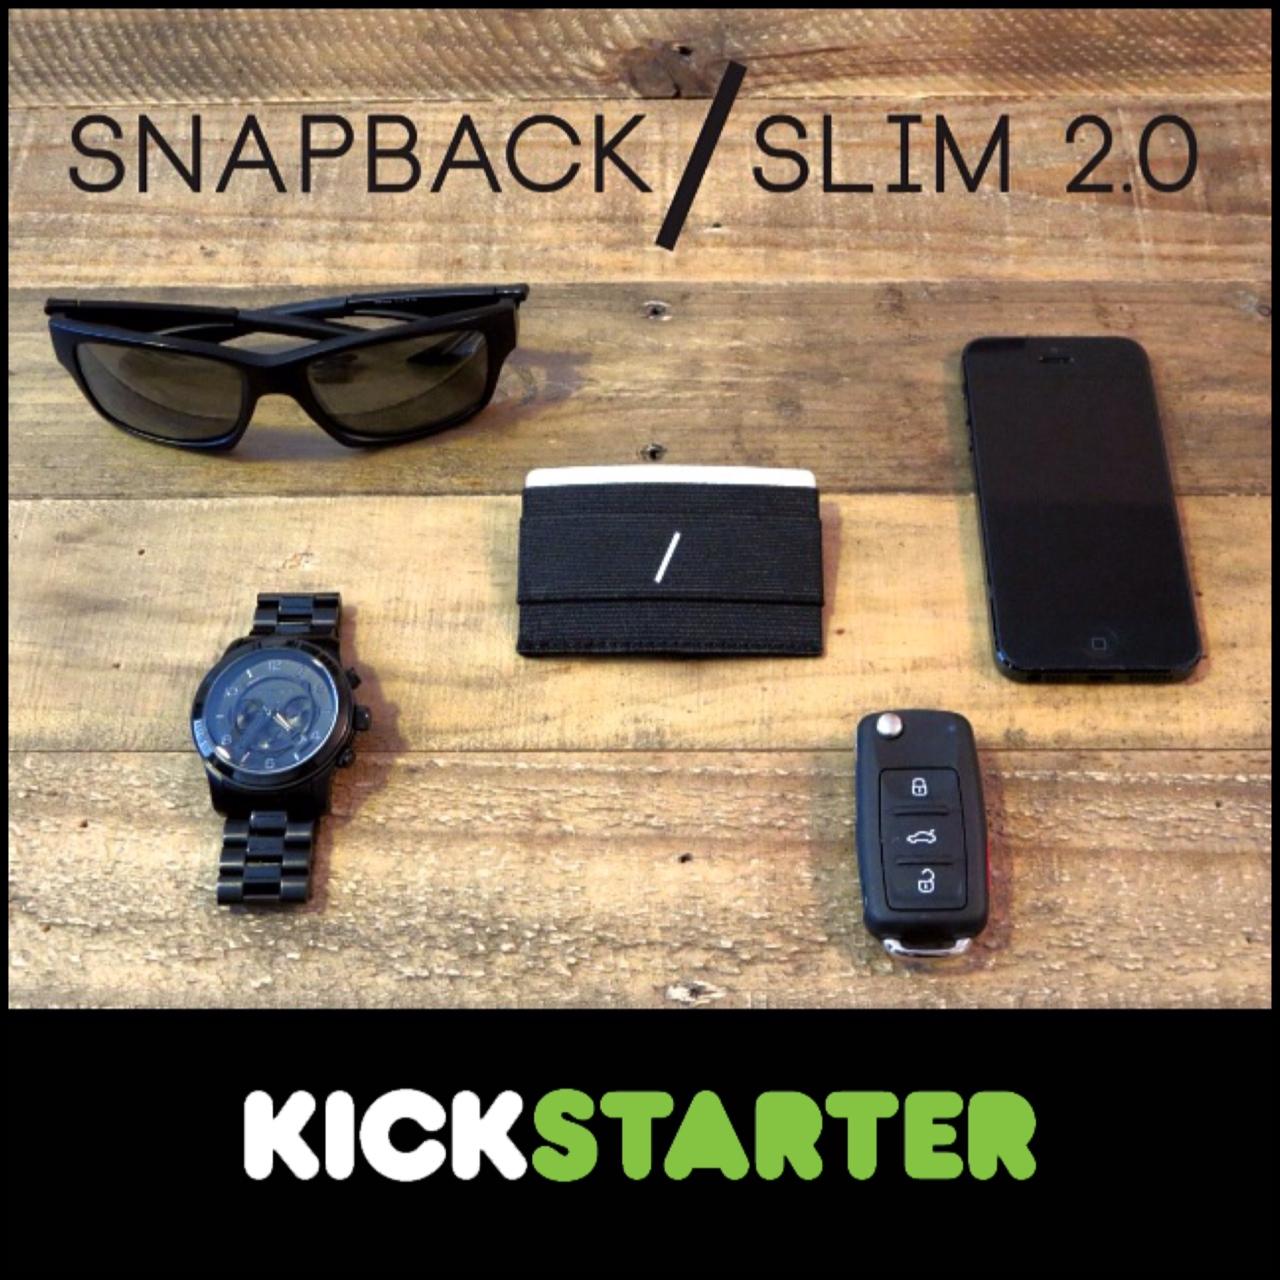 The superior Snapback Slim 2.0